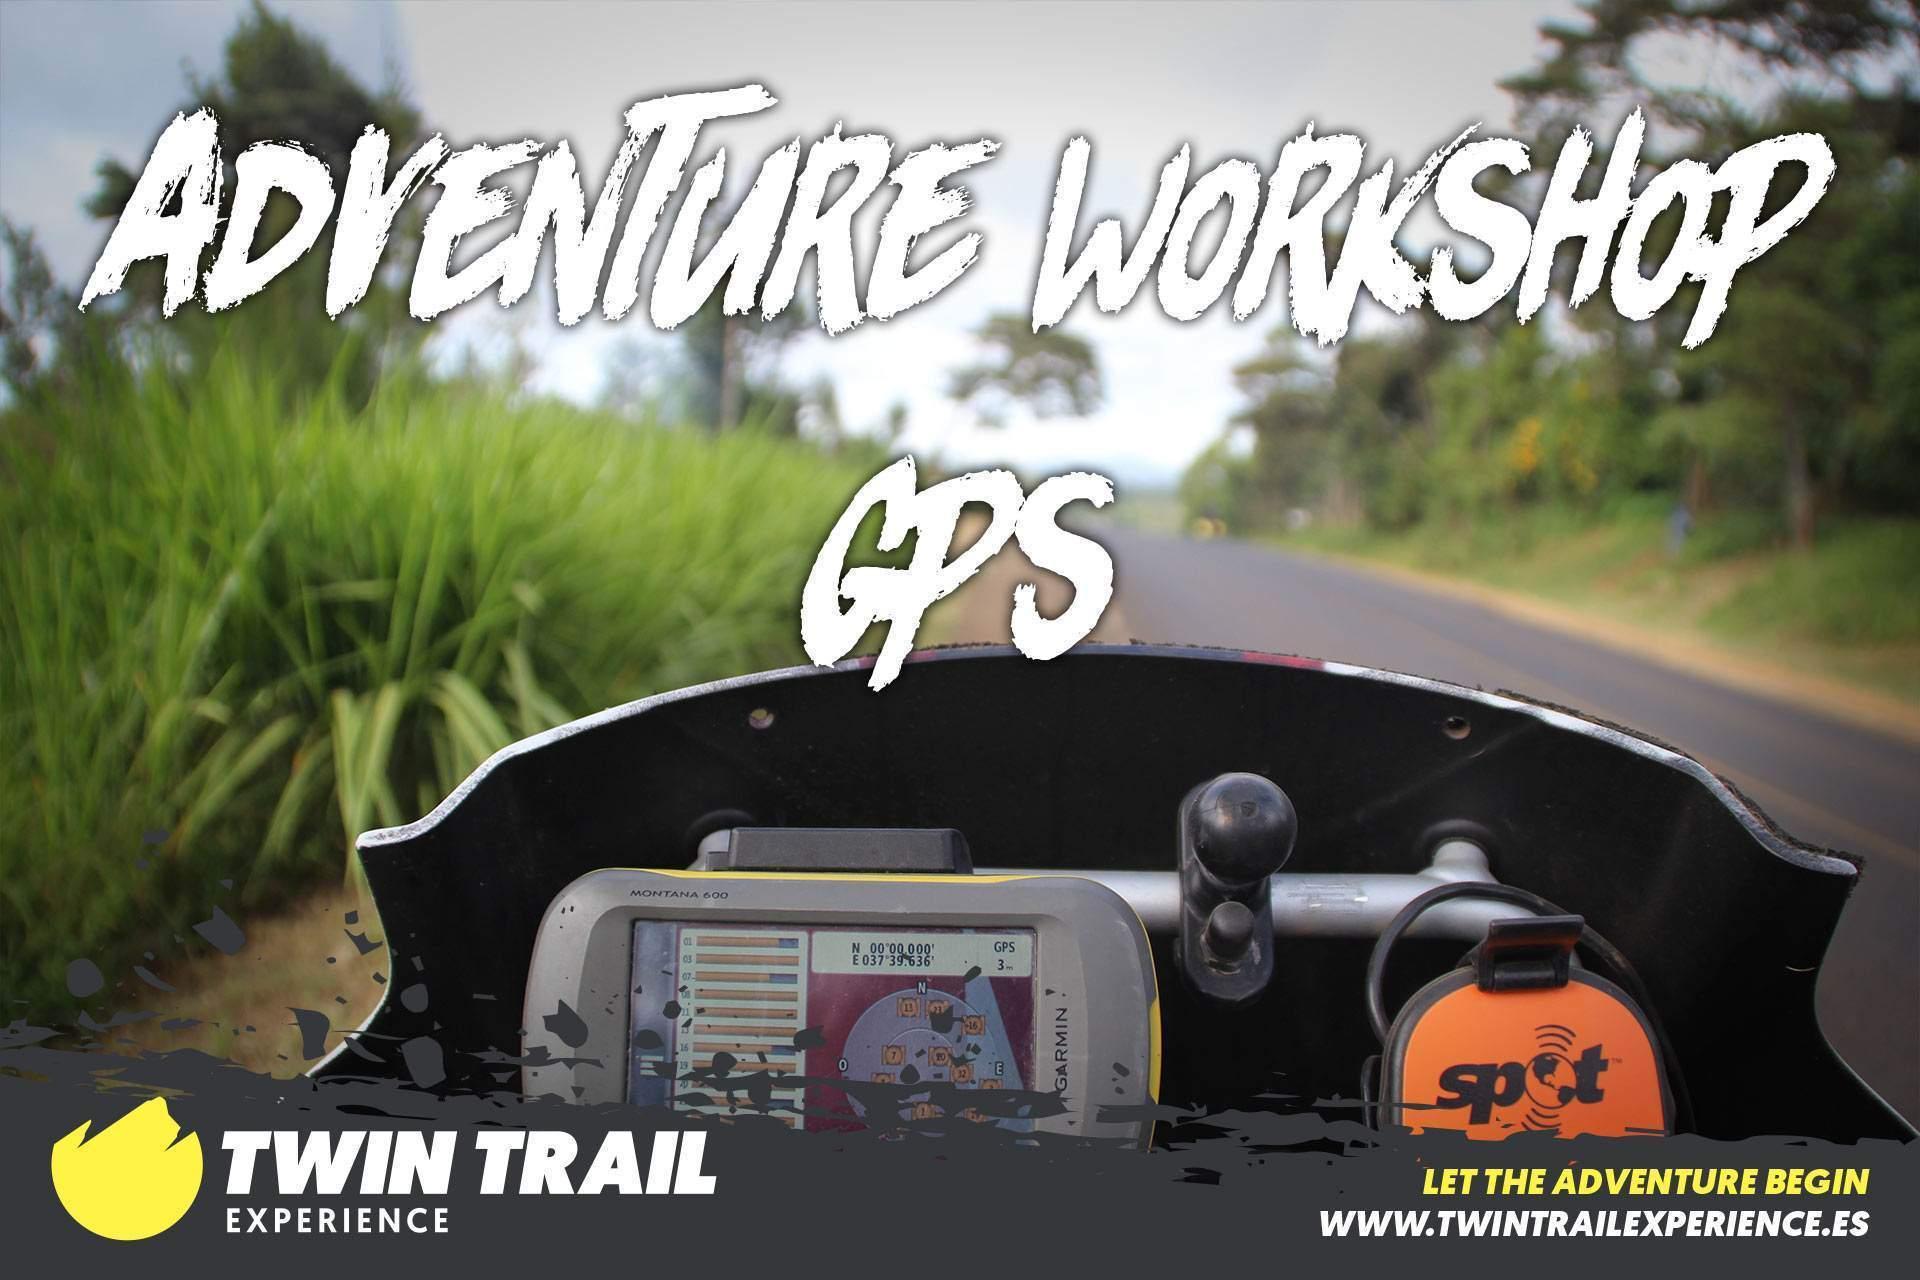 Adventure Workshop: GPS